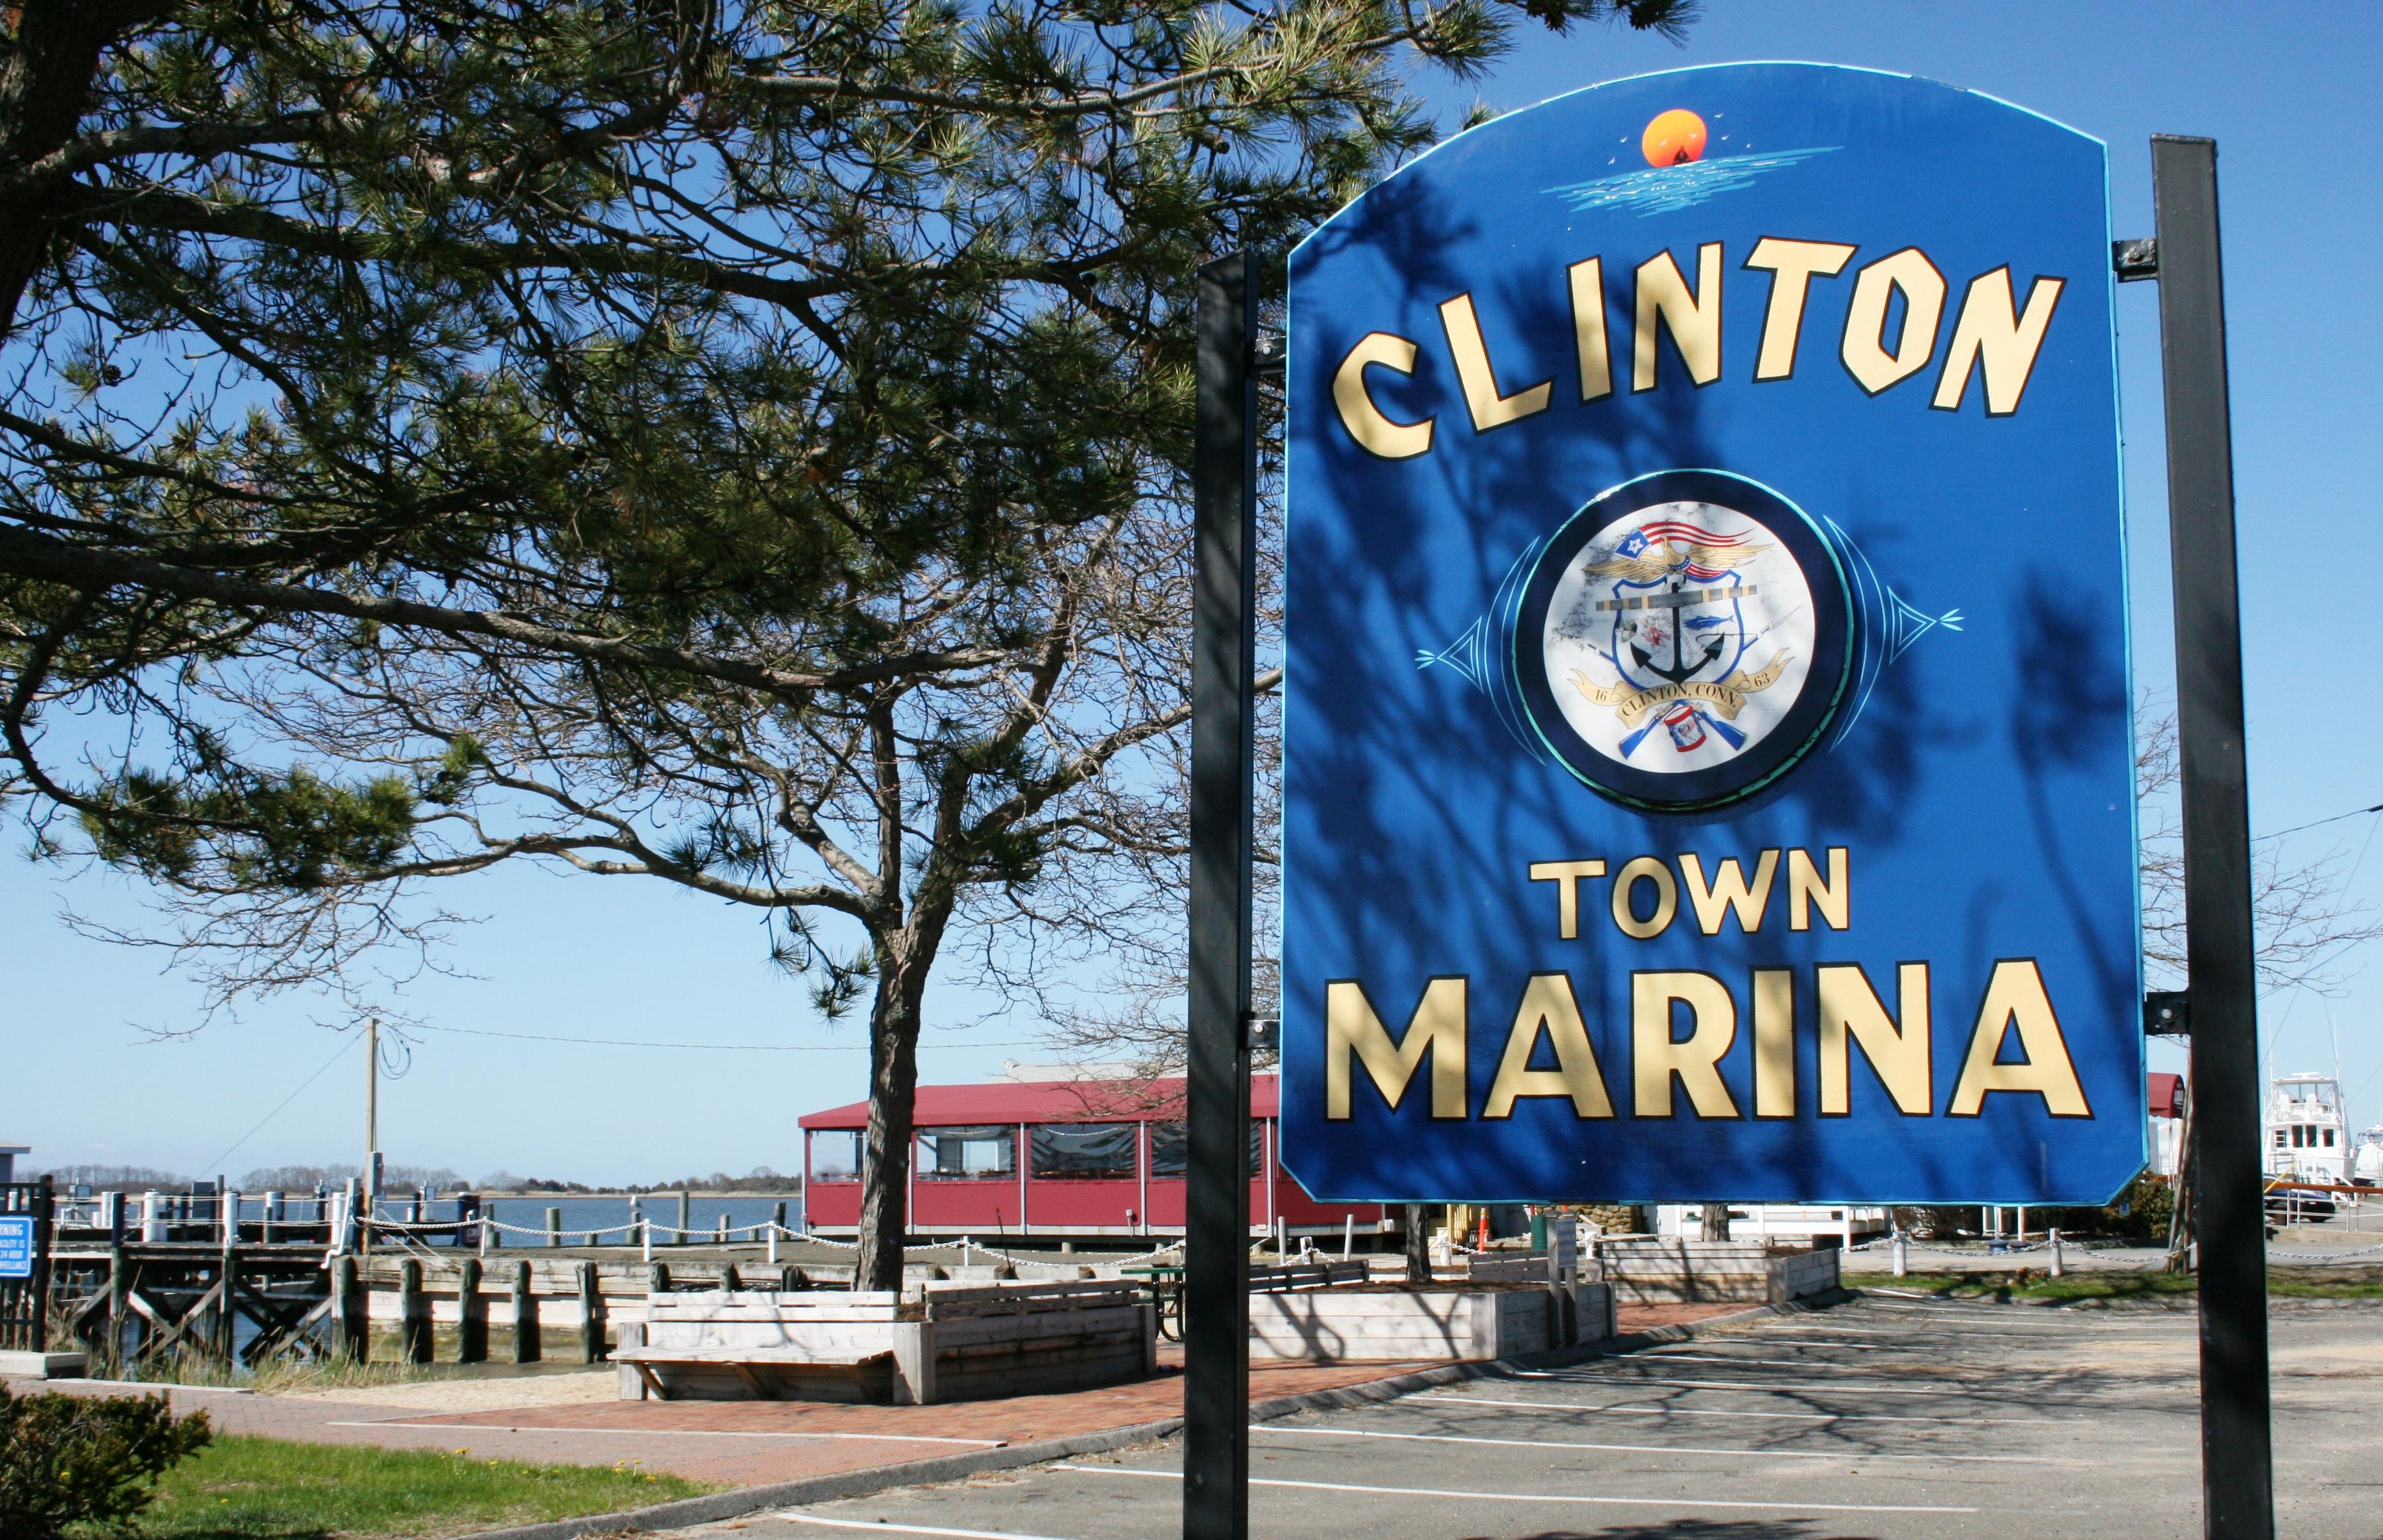 clinton town marina